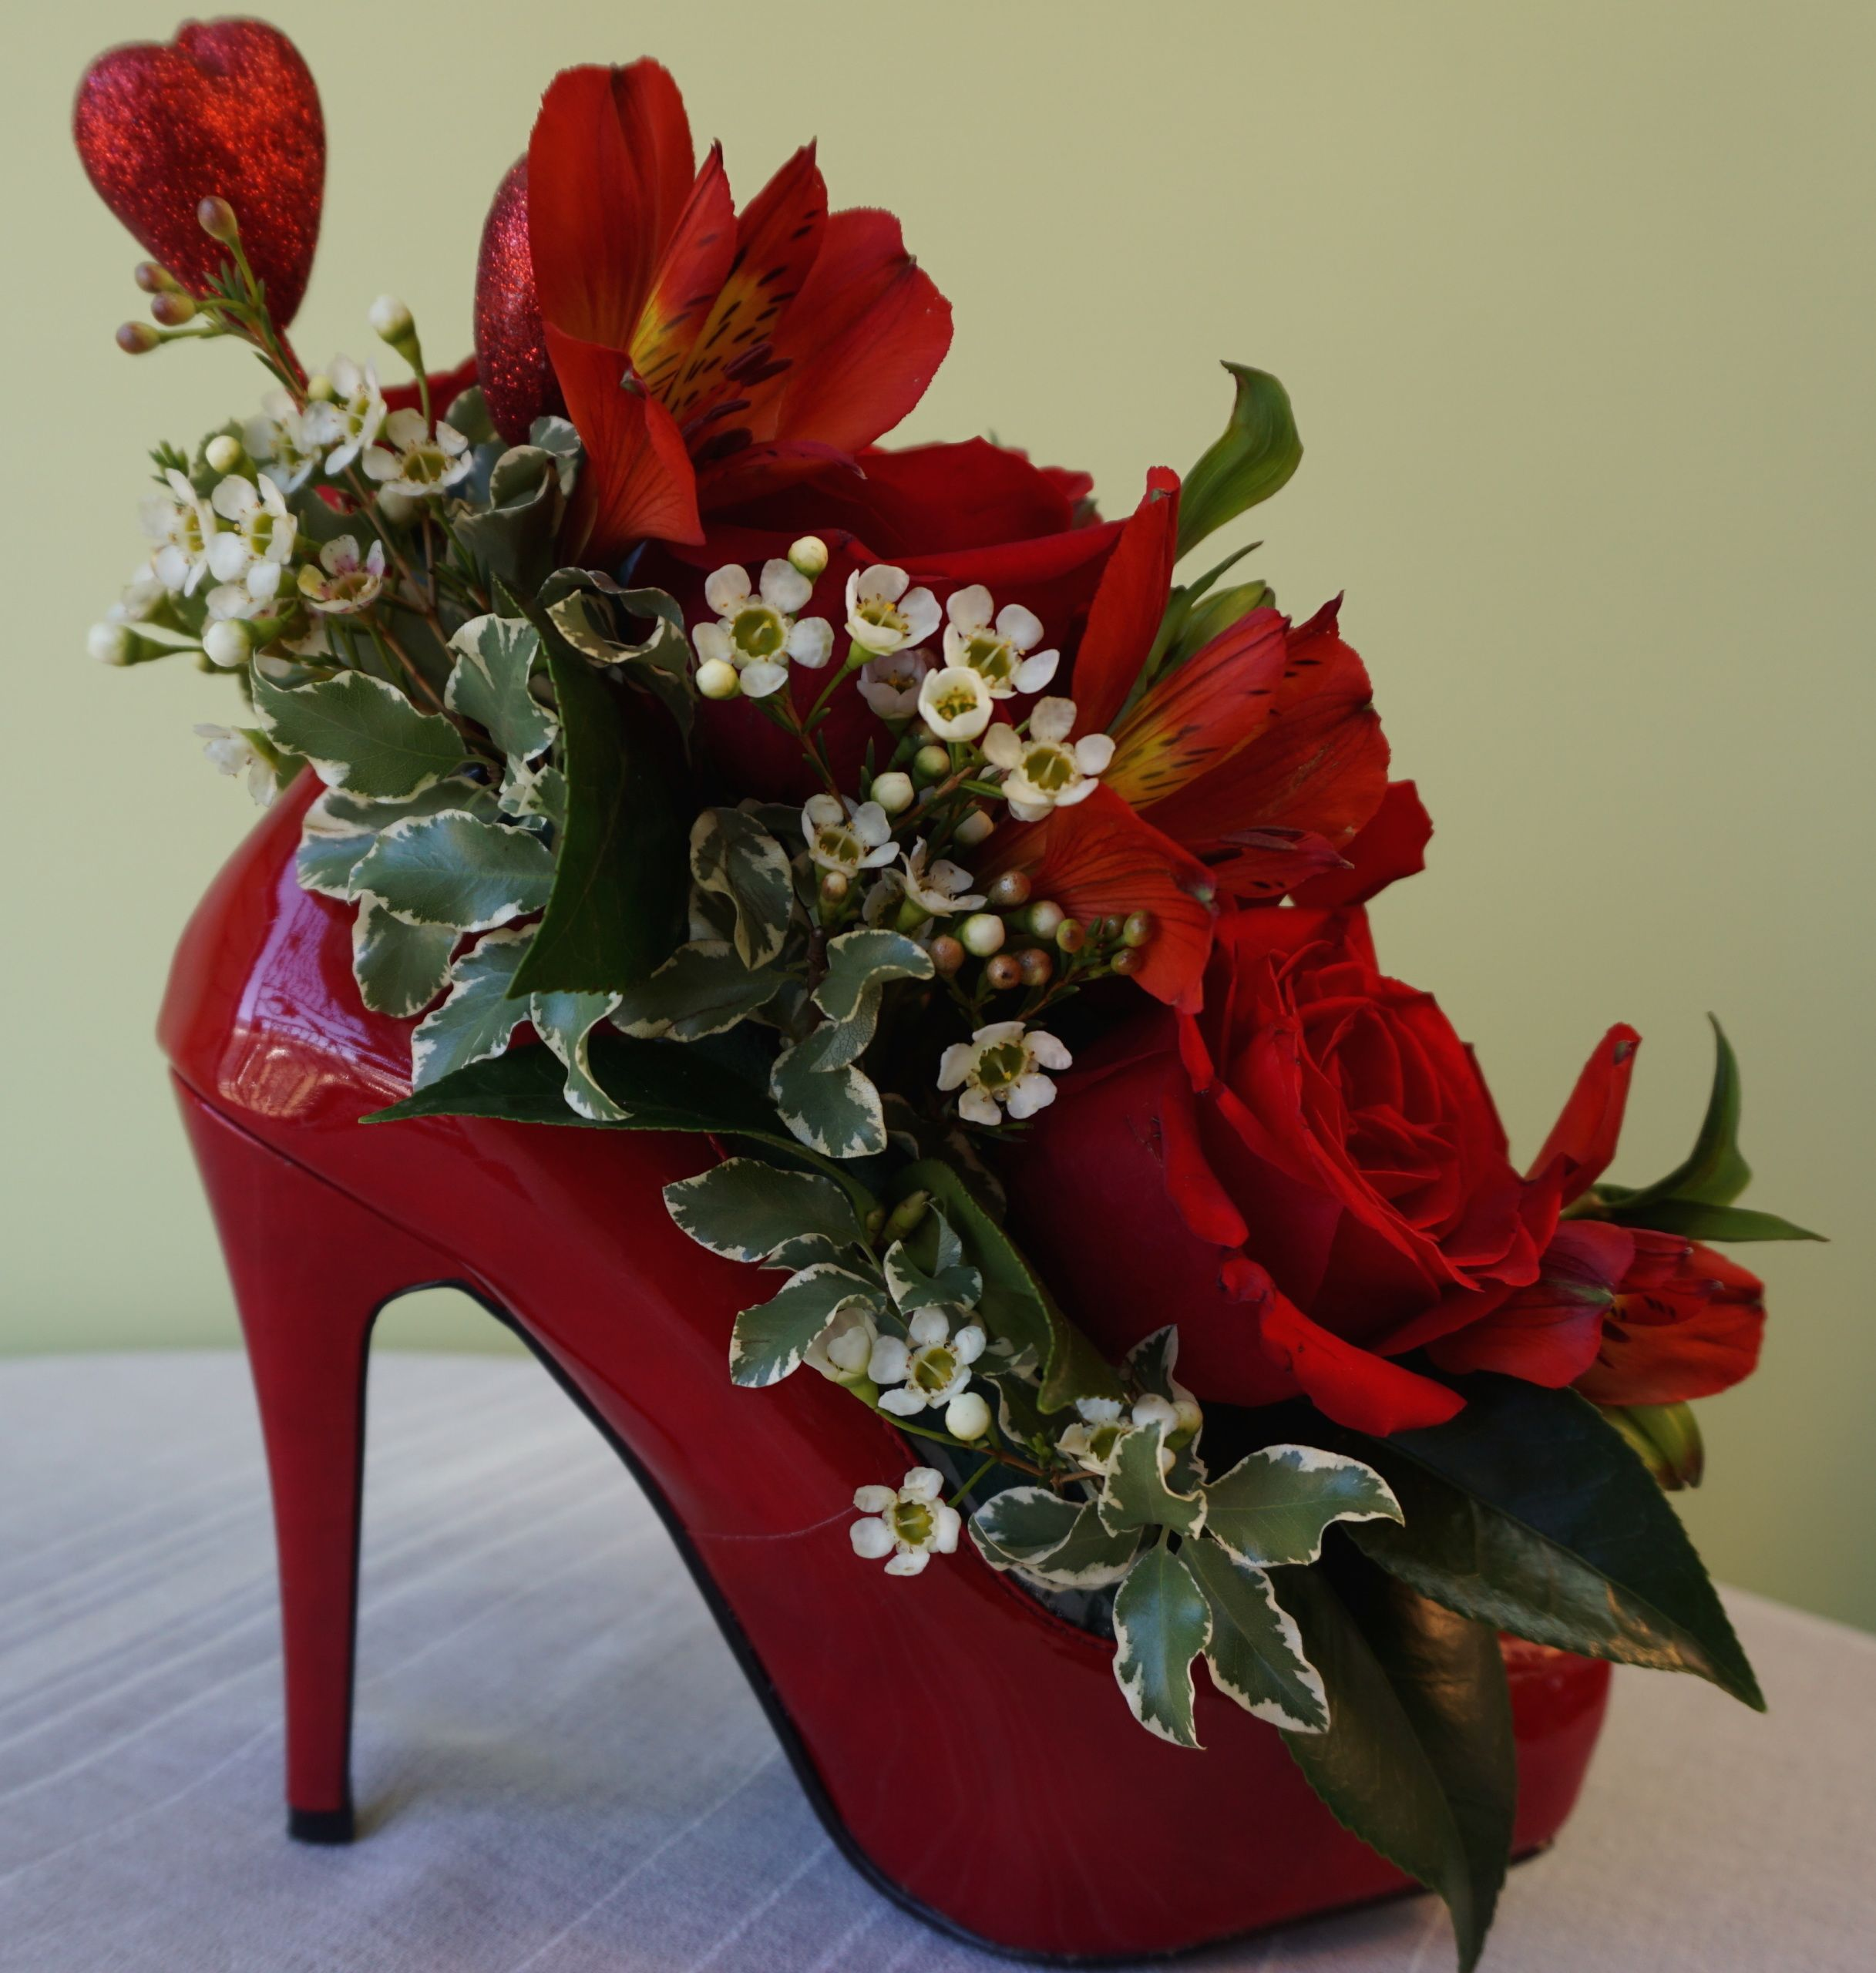 Marvelous #Flower Arrangement In A High Heel Shoe   #Home #Decor